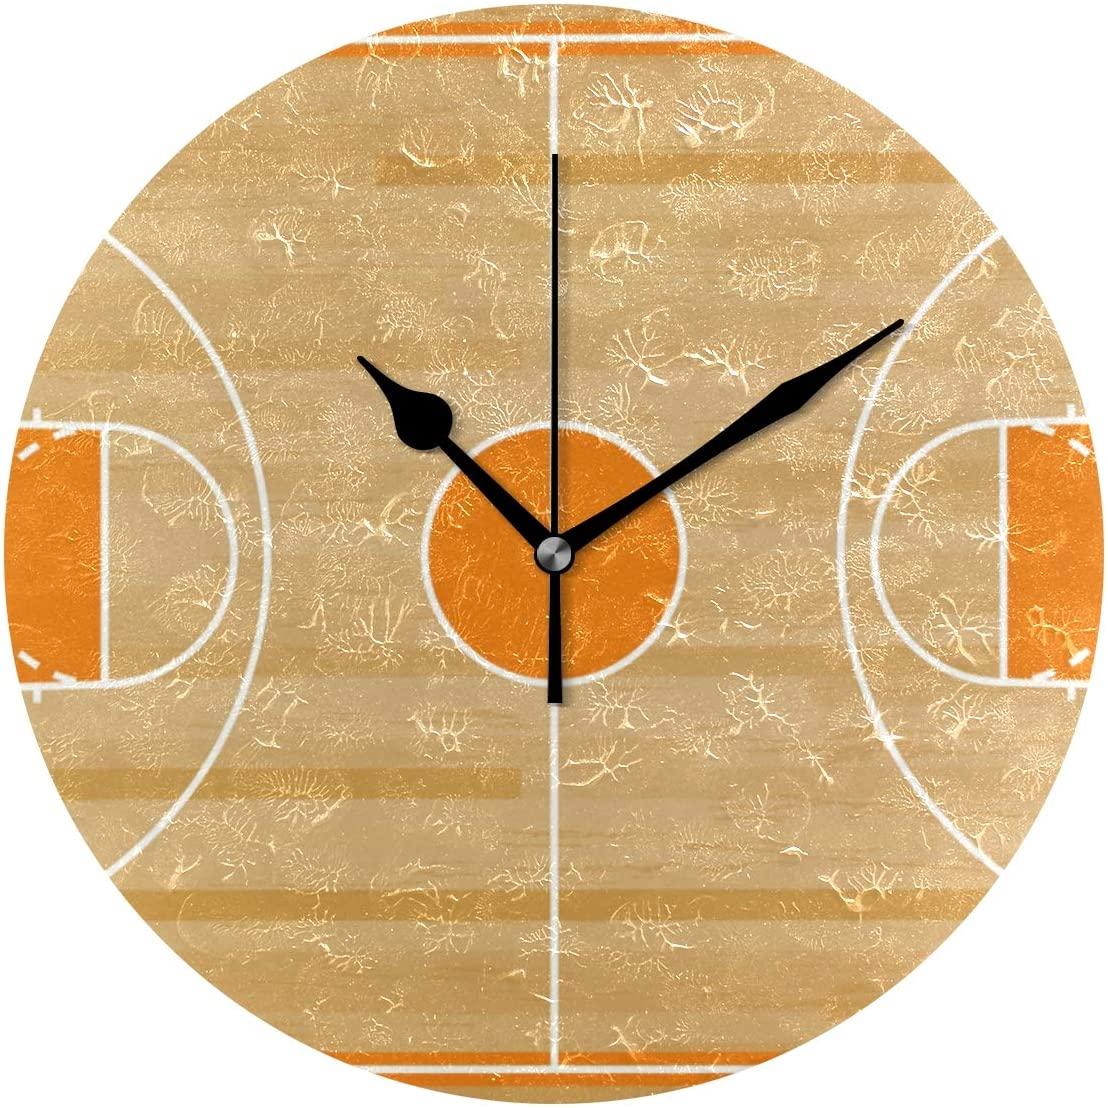 MERRYSUGAR Wall Clock Basketball Field Silent Non Ticking Digital 9 Inch Round Clock Easy to Read Desk Clock for Home Kitchen Office School Home Decor